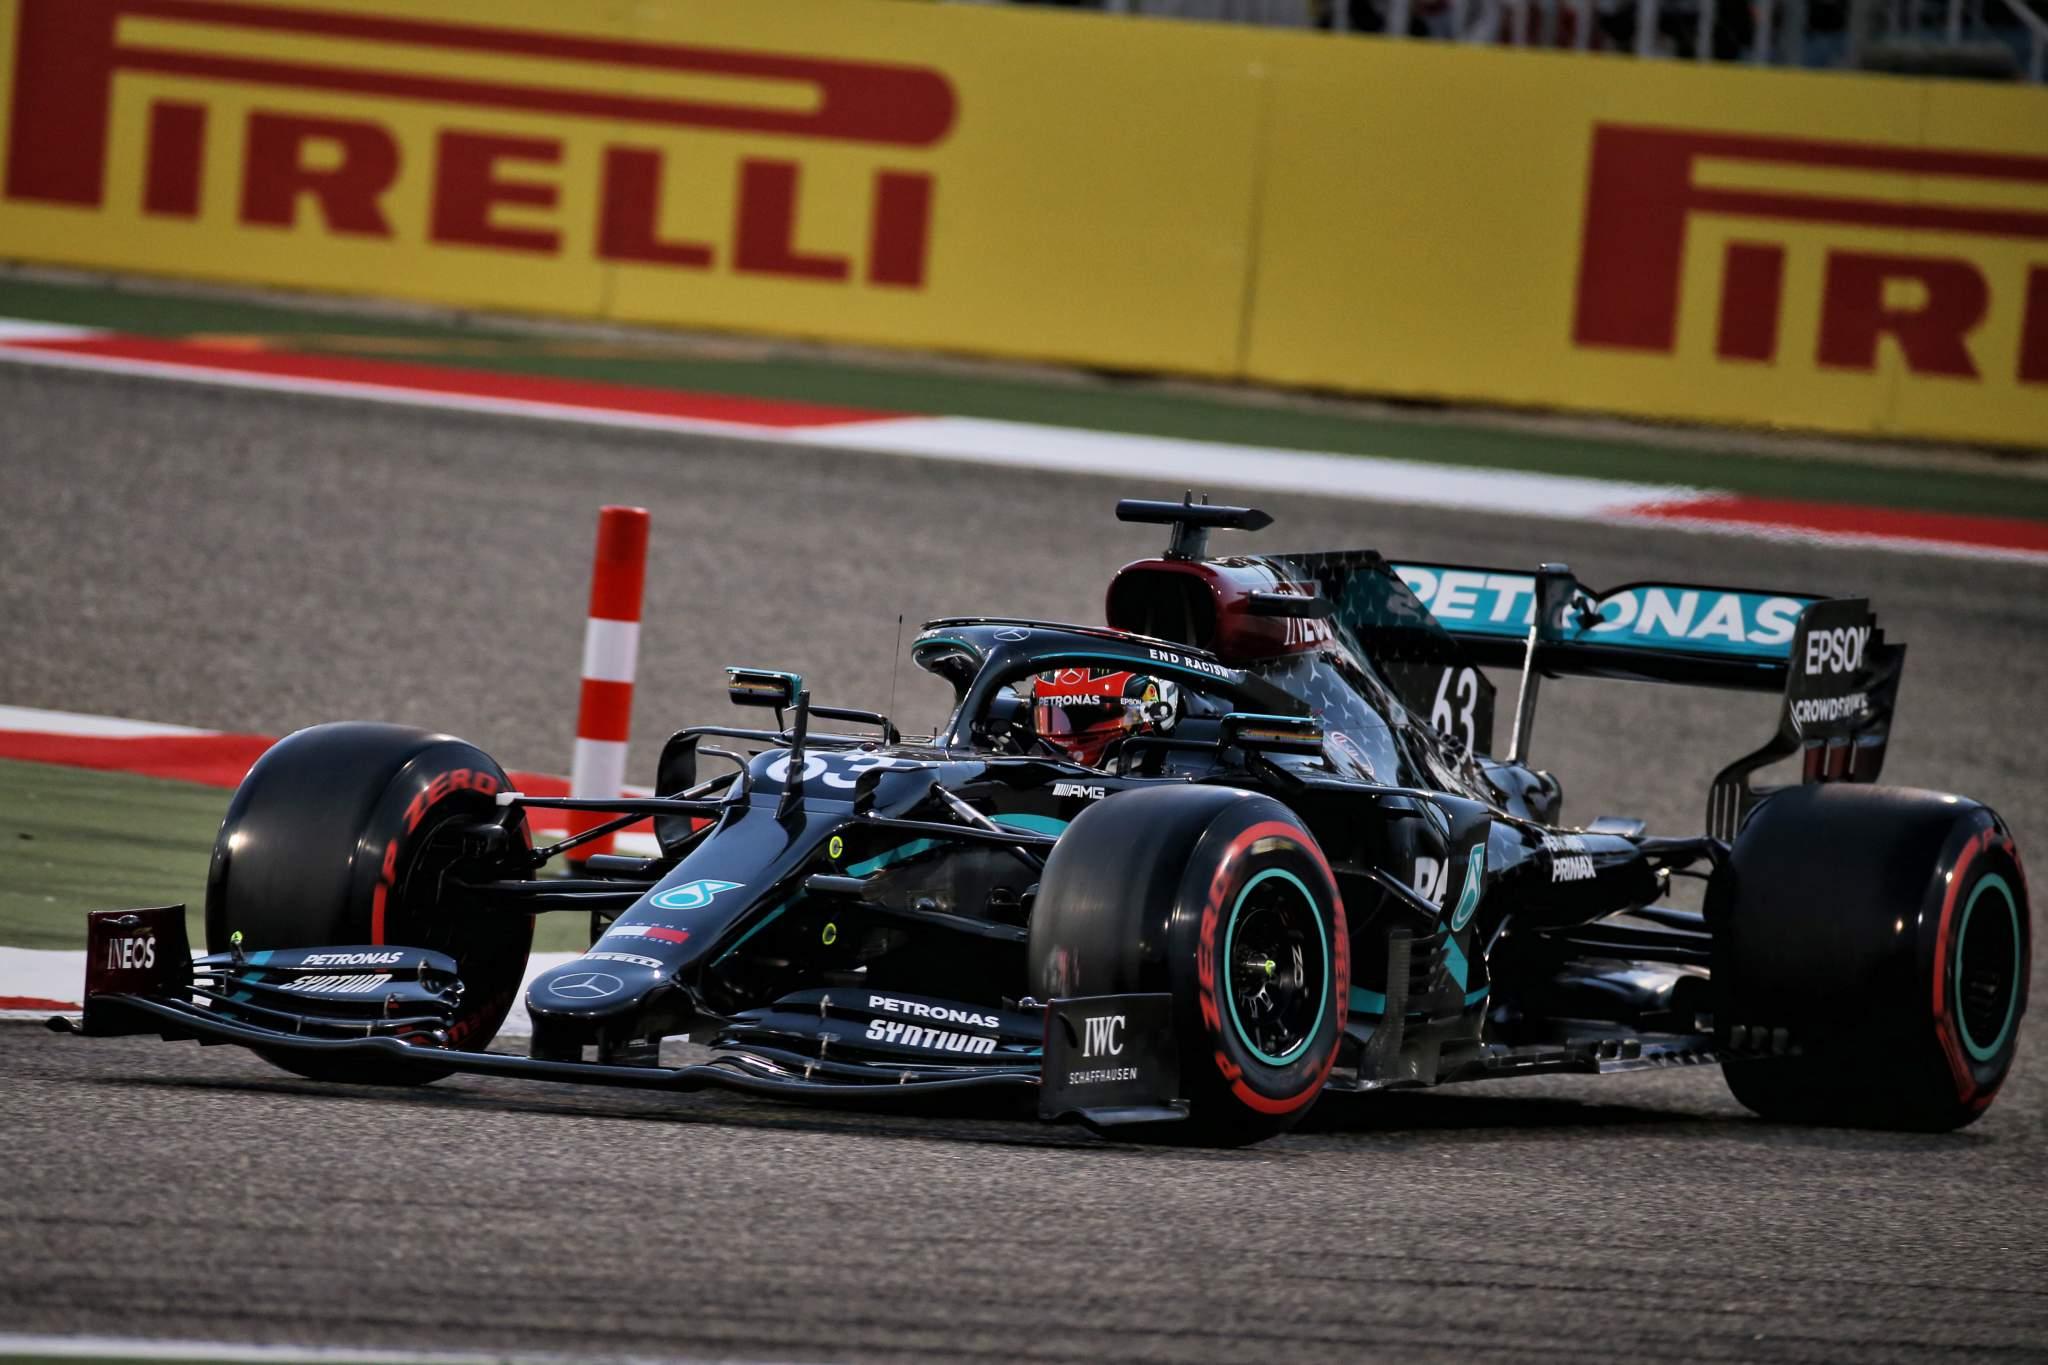 George Russell Mercedes Sakhir Grand Prix 2020